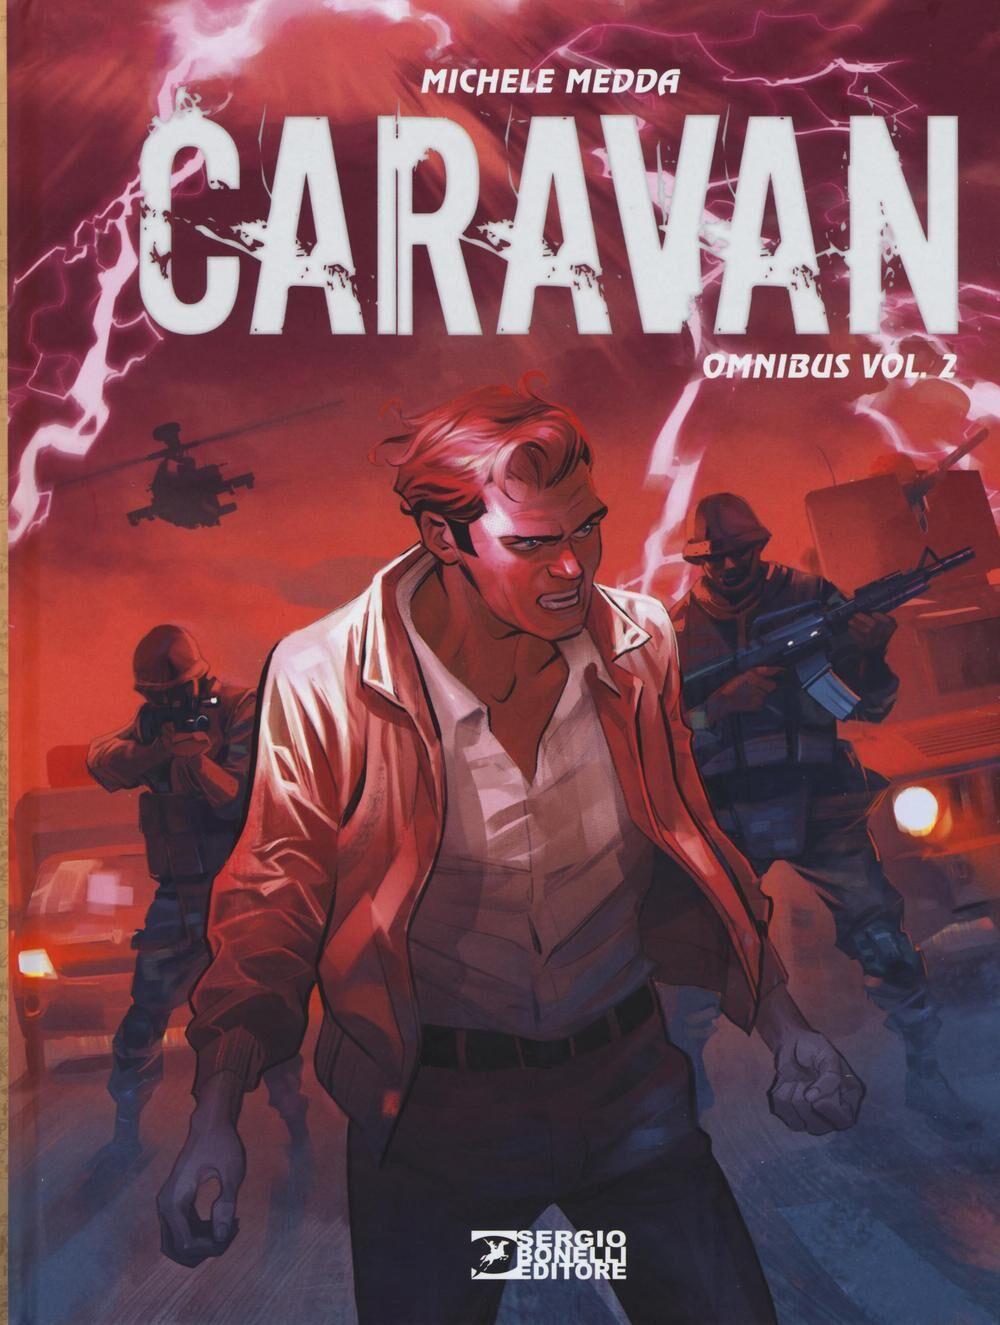 Caravan. Omnibus. Vol. 2